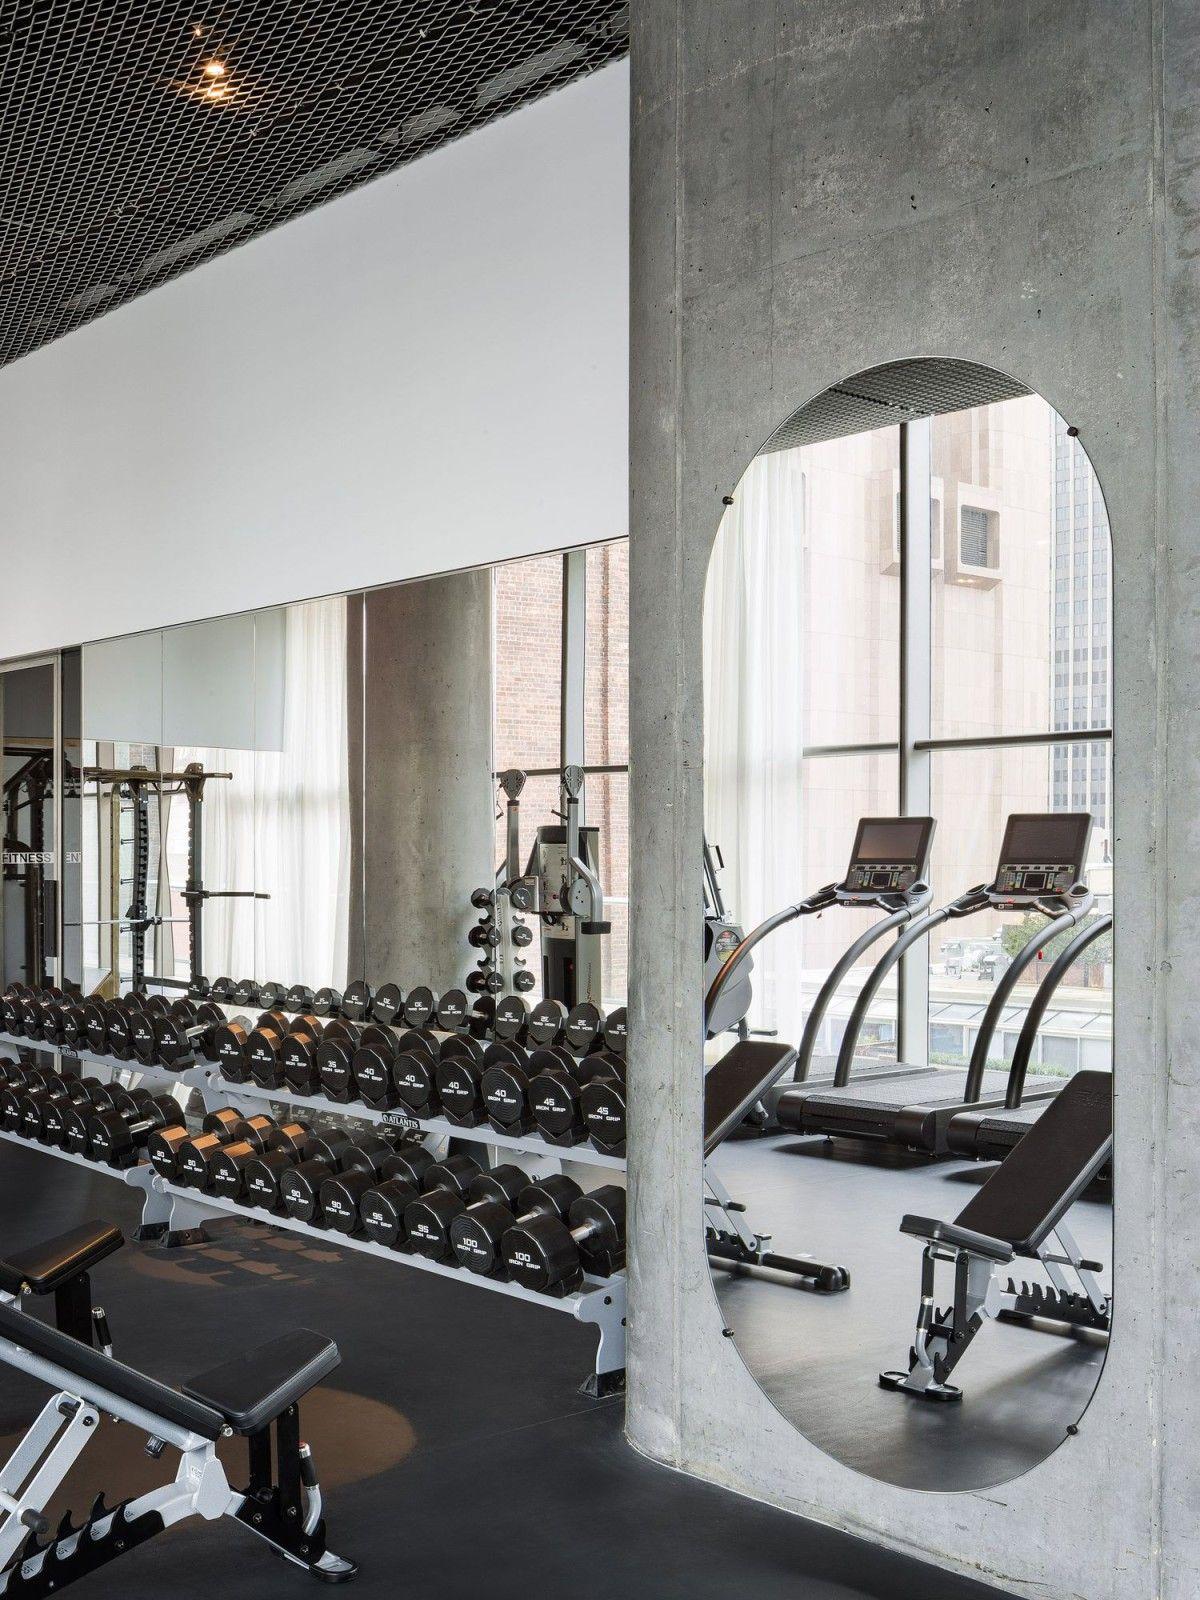 Herzog de meuron leonard new york gym in gym